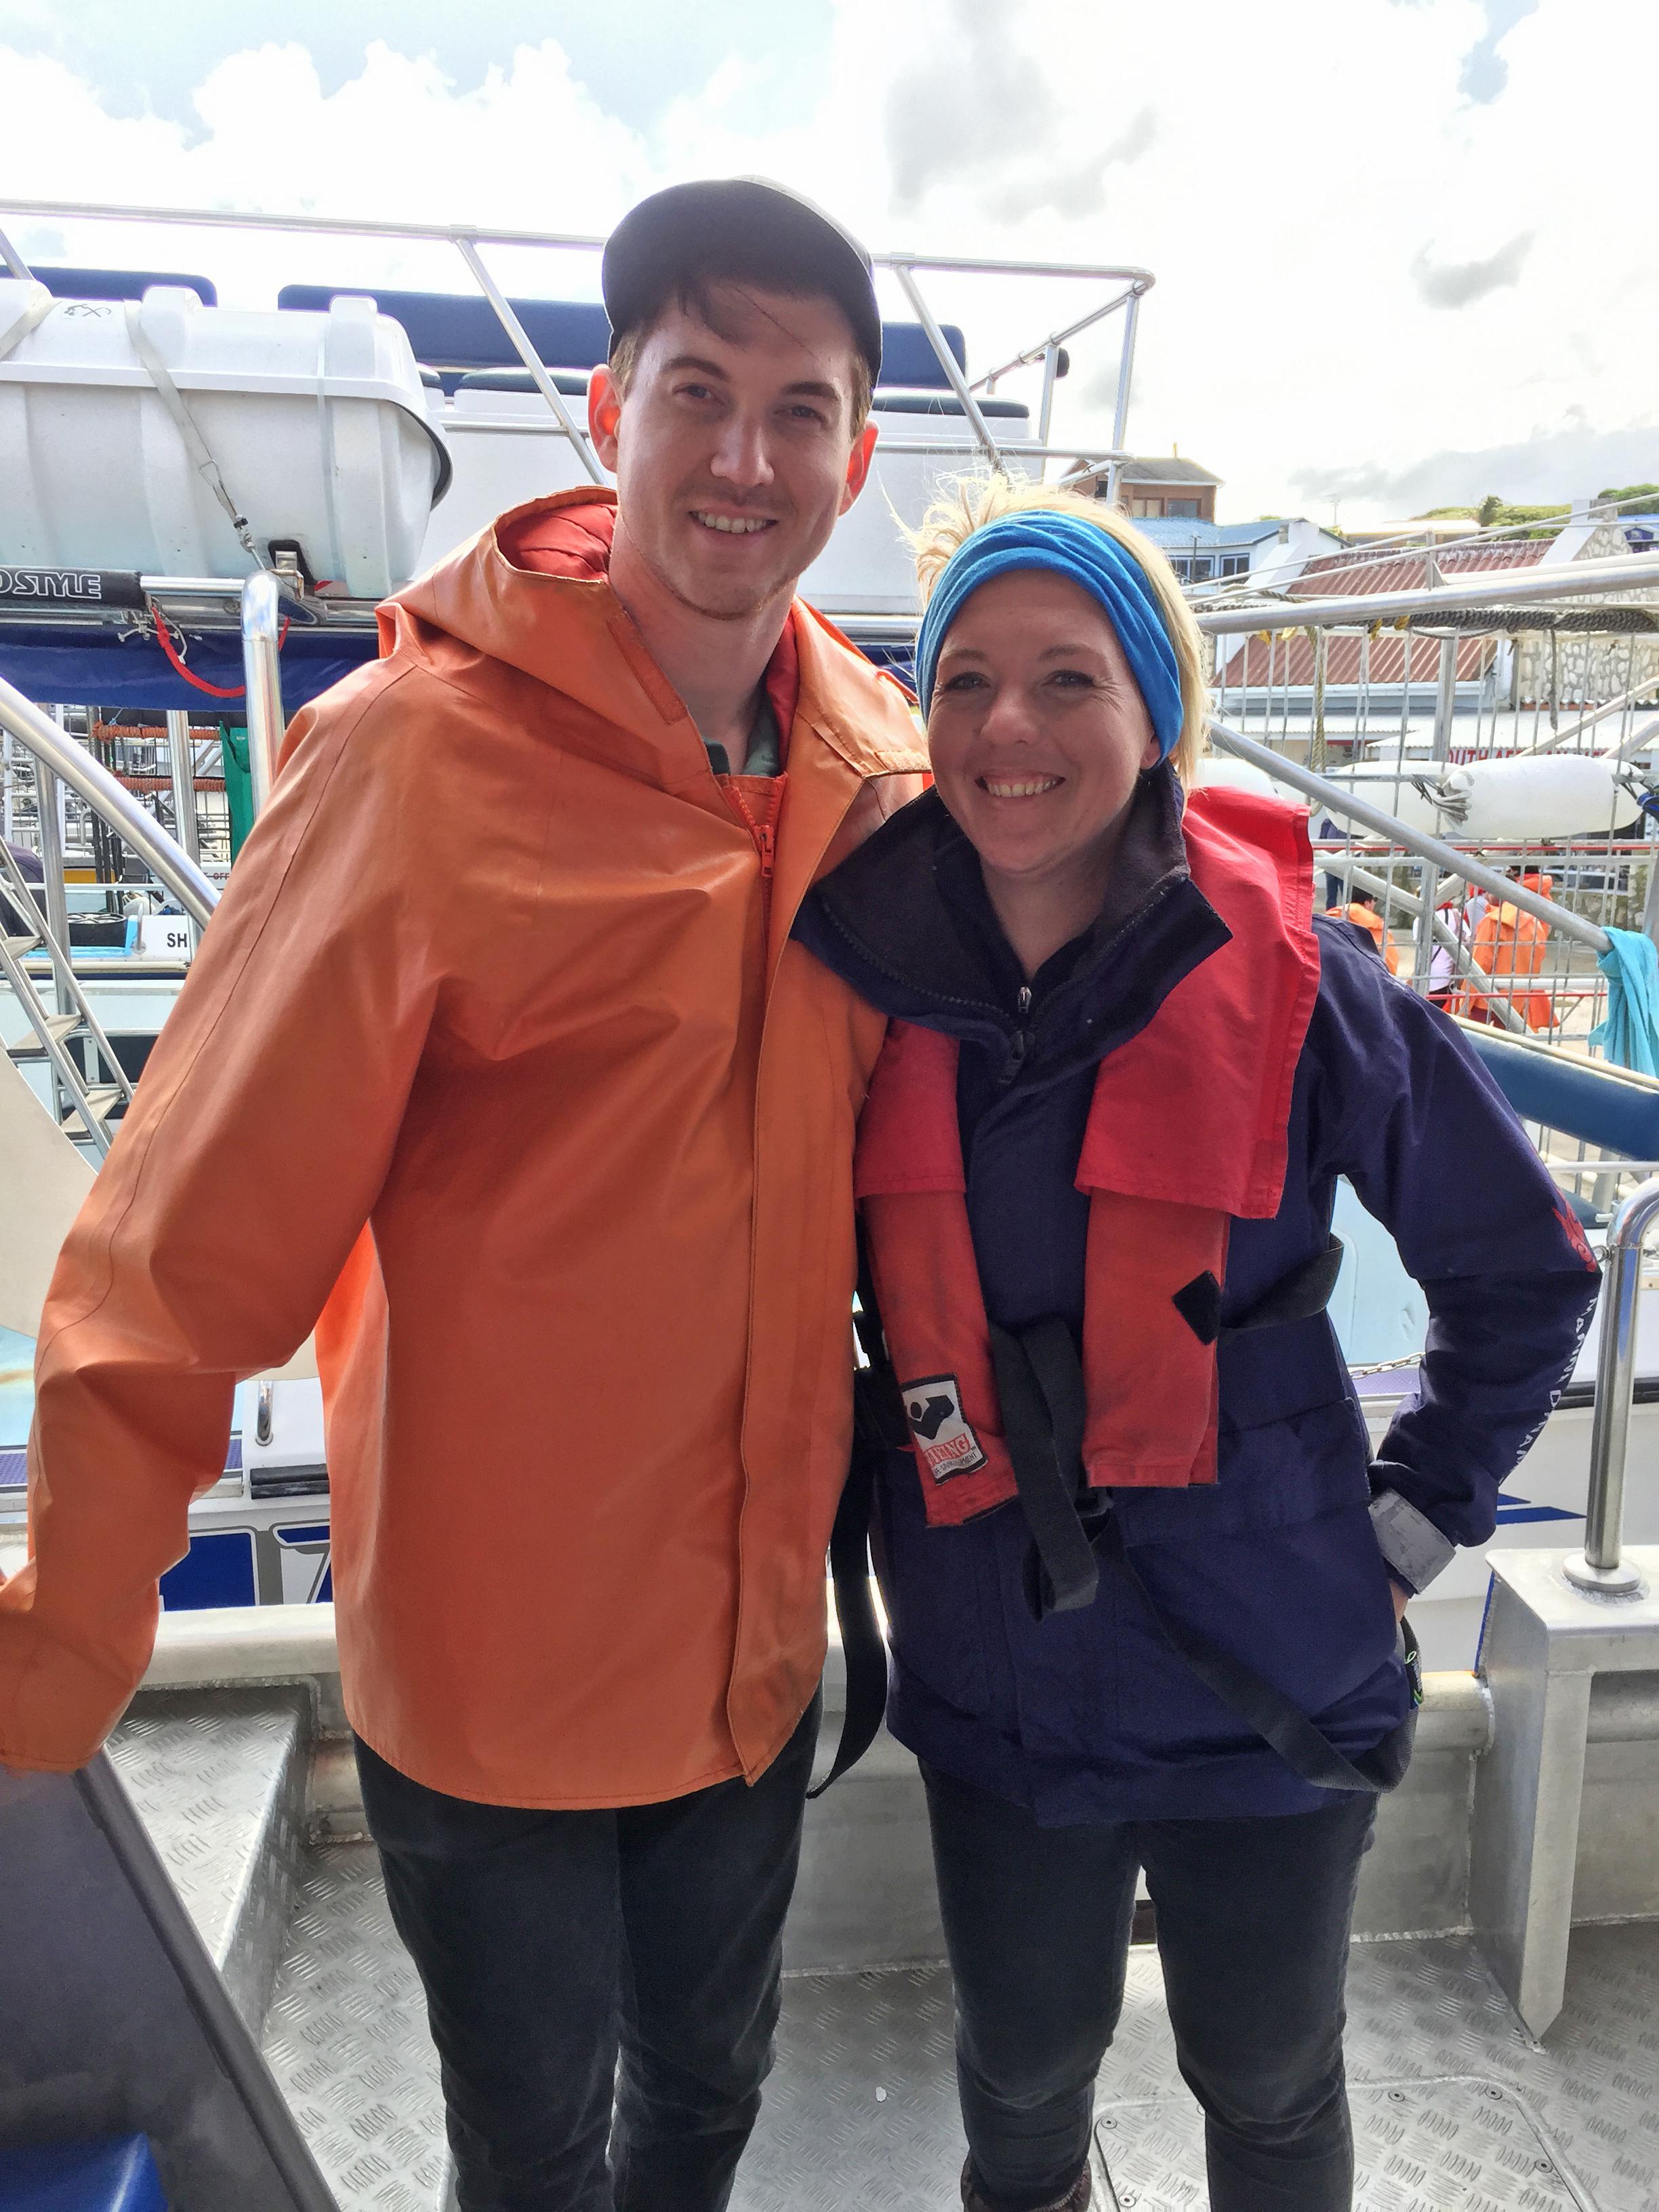 Gretha, our guide aboard Marine Dynamics Cruise